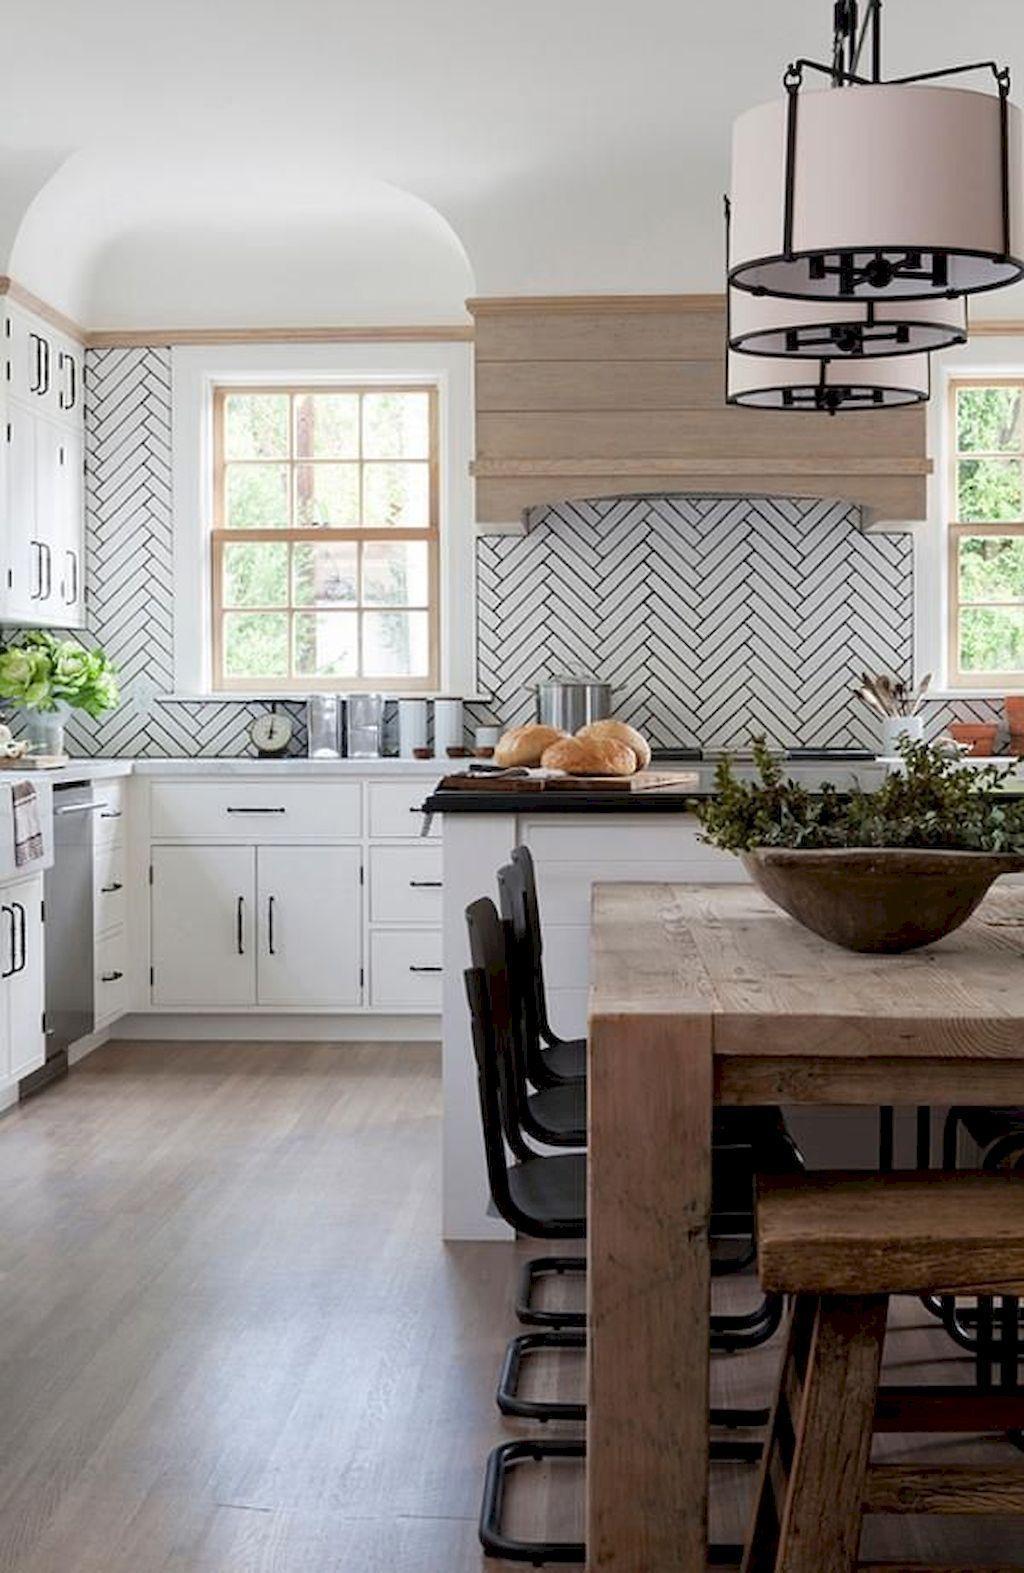 1960s Kitchen Remodel Before After: 100 Stunning Kitchen Backsplash Decorating Ideas And